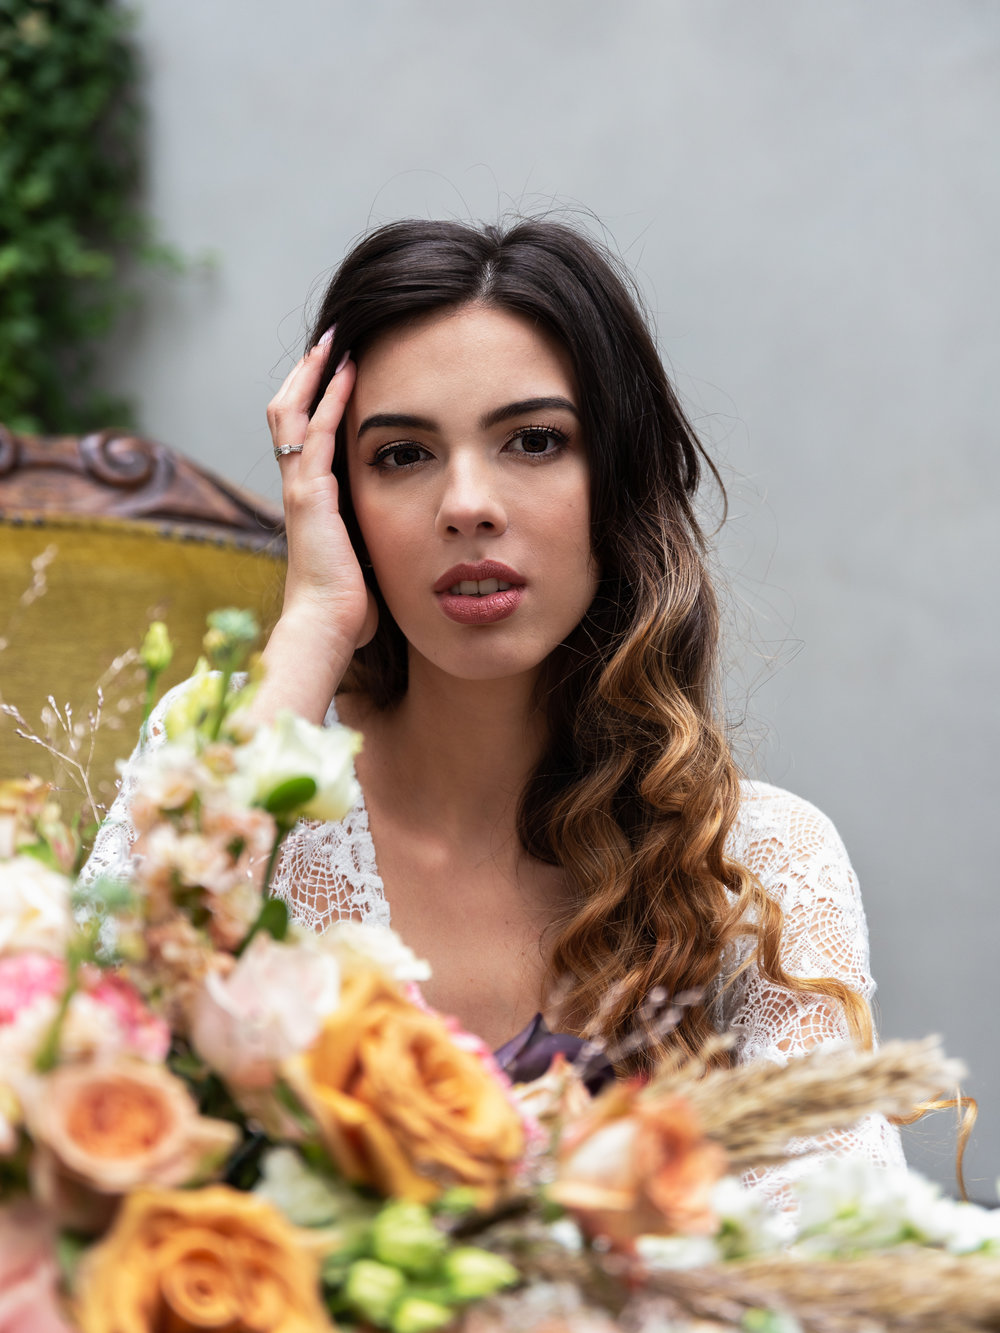 styled-bridal-7.jpg